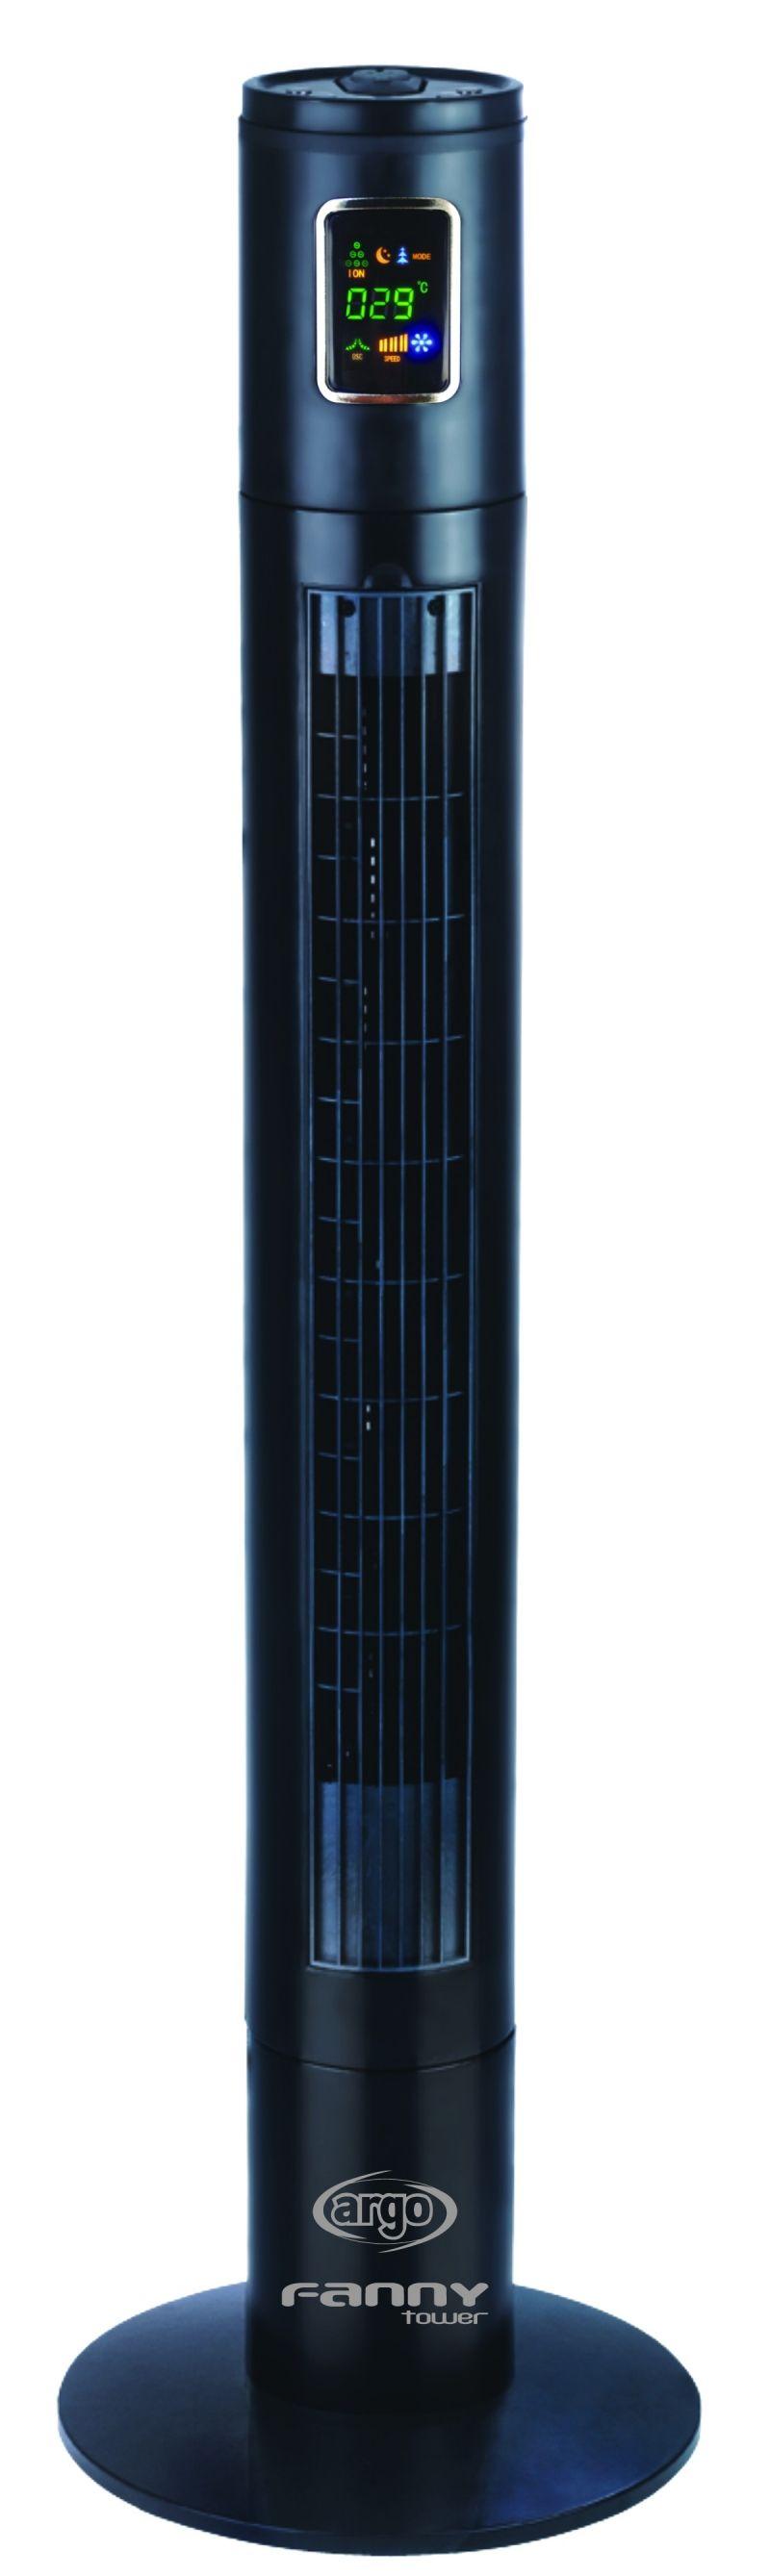 Ventilator Turn Argo Fanny, Debit 616 m3 / h, Consum 45 W/h, Control digital, Timer, Telecomanda, 3 trepte